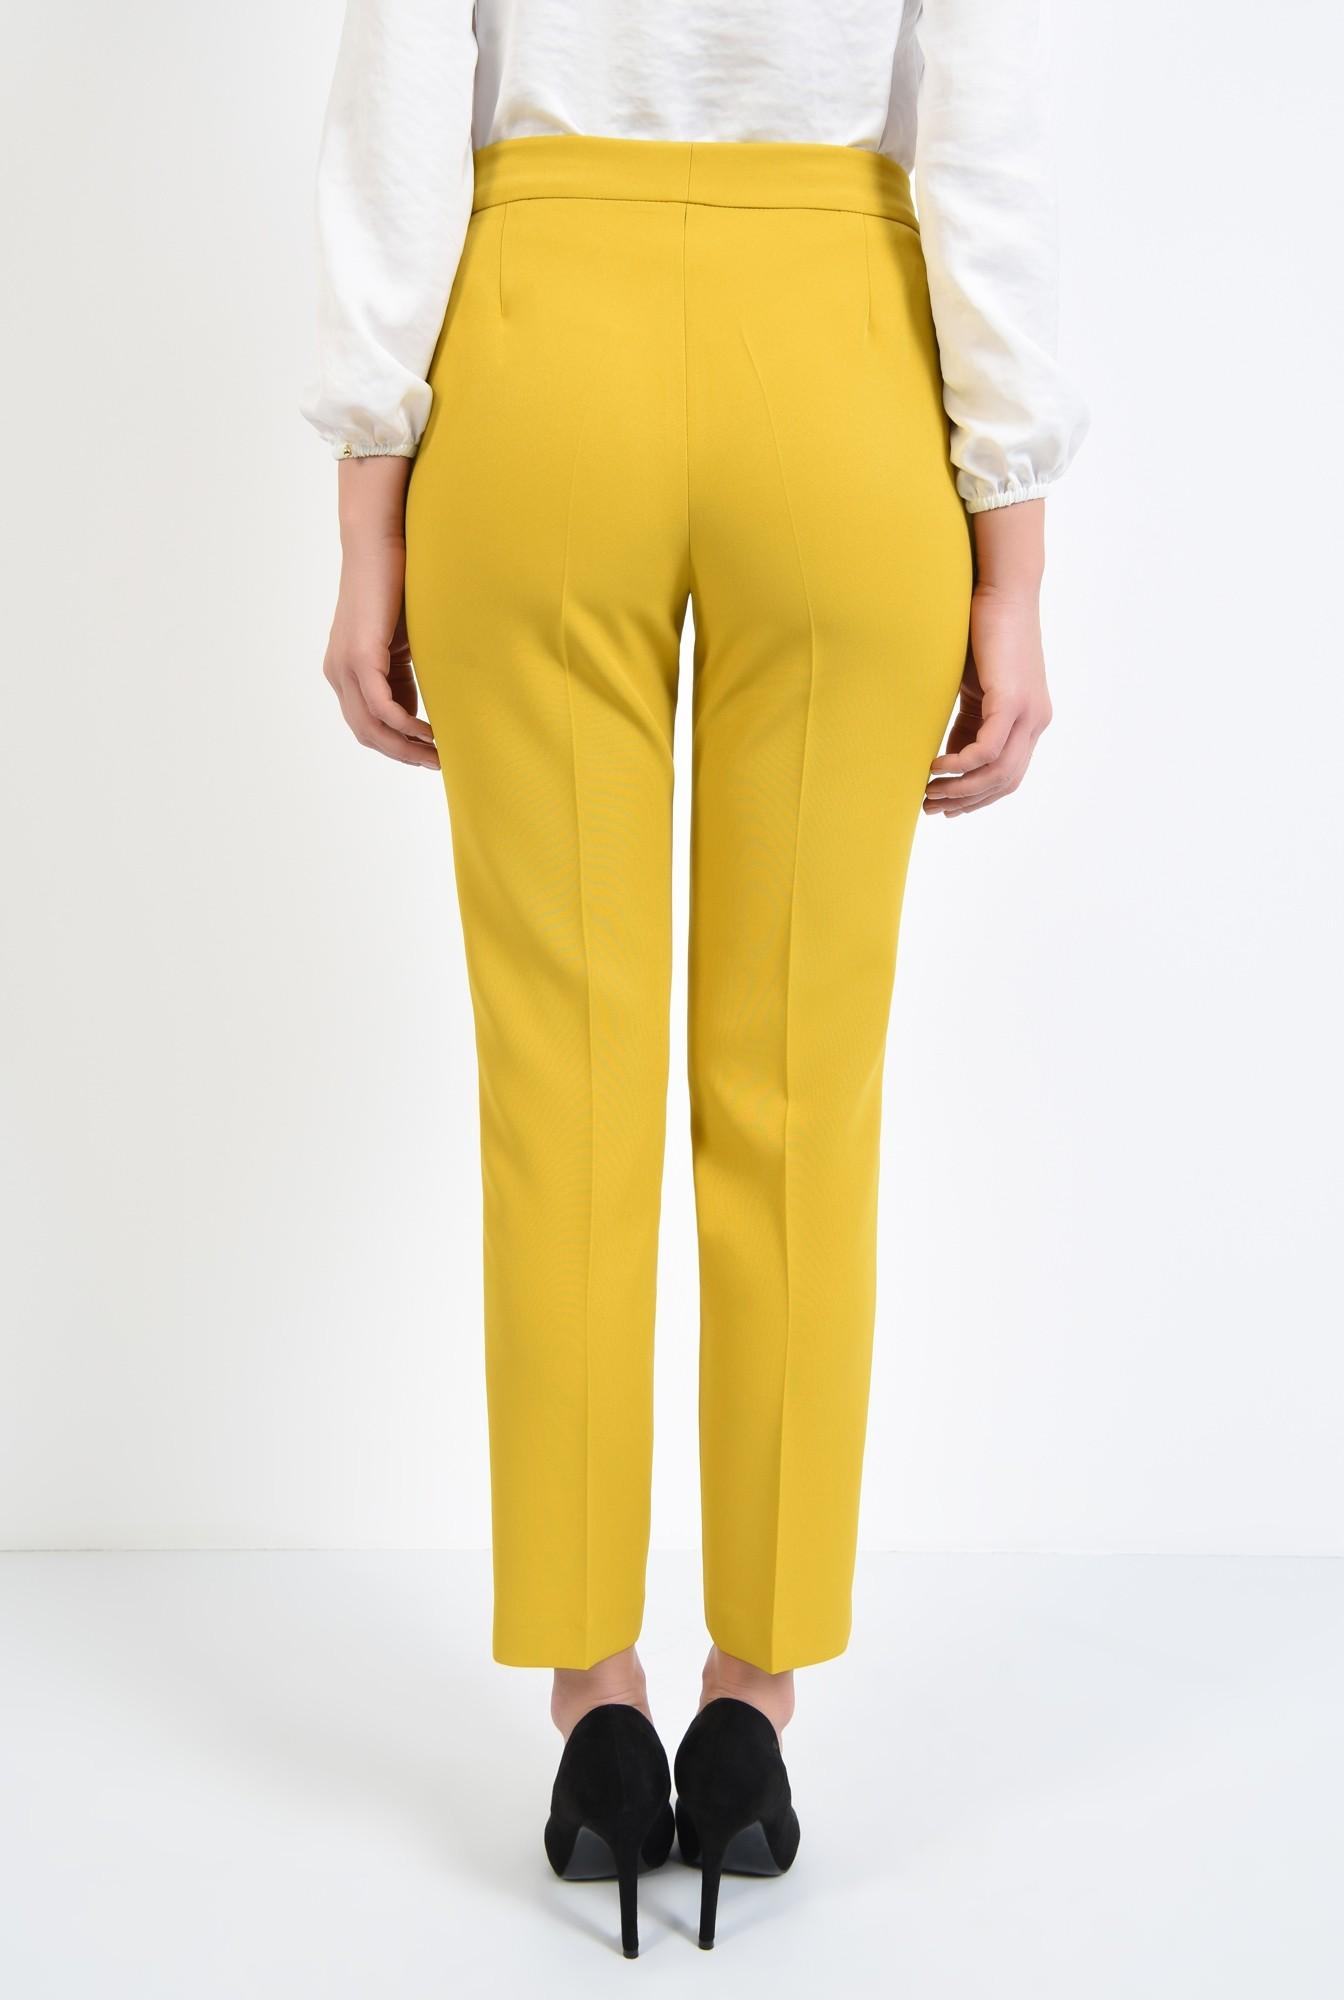 1 - pantaloni casual, tigareta, croi la dunga, mustar, pantaloni conici